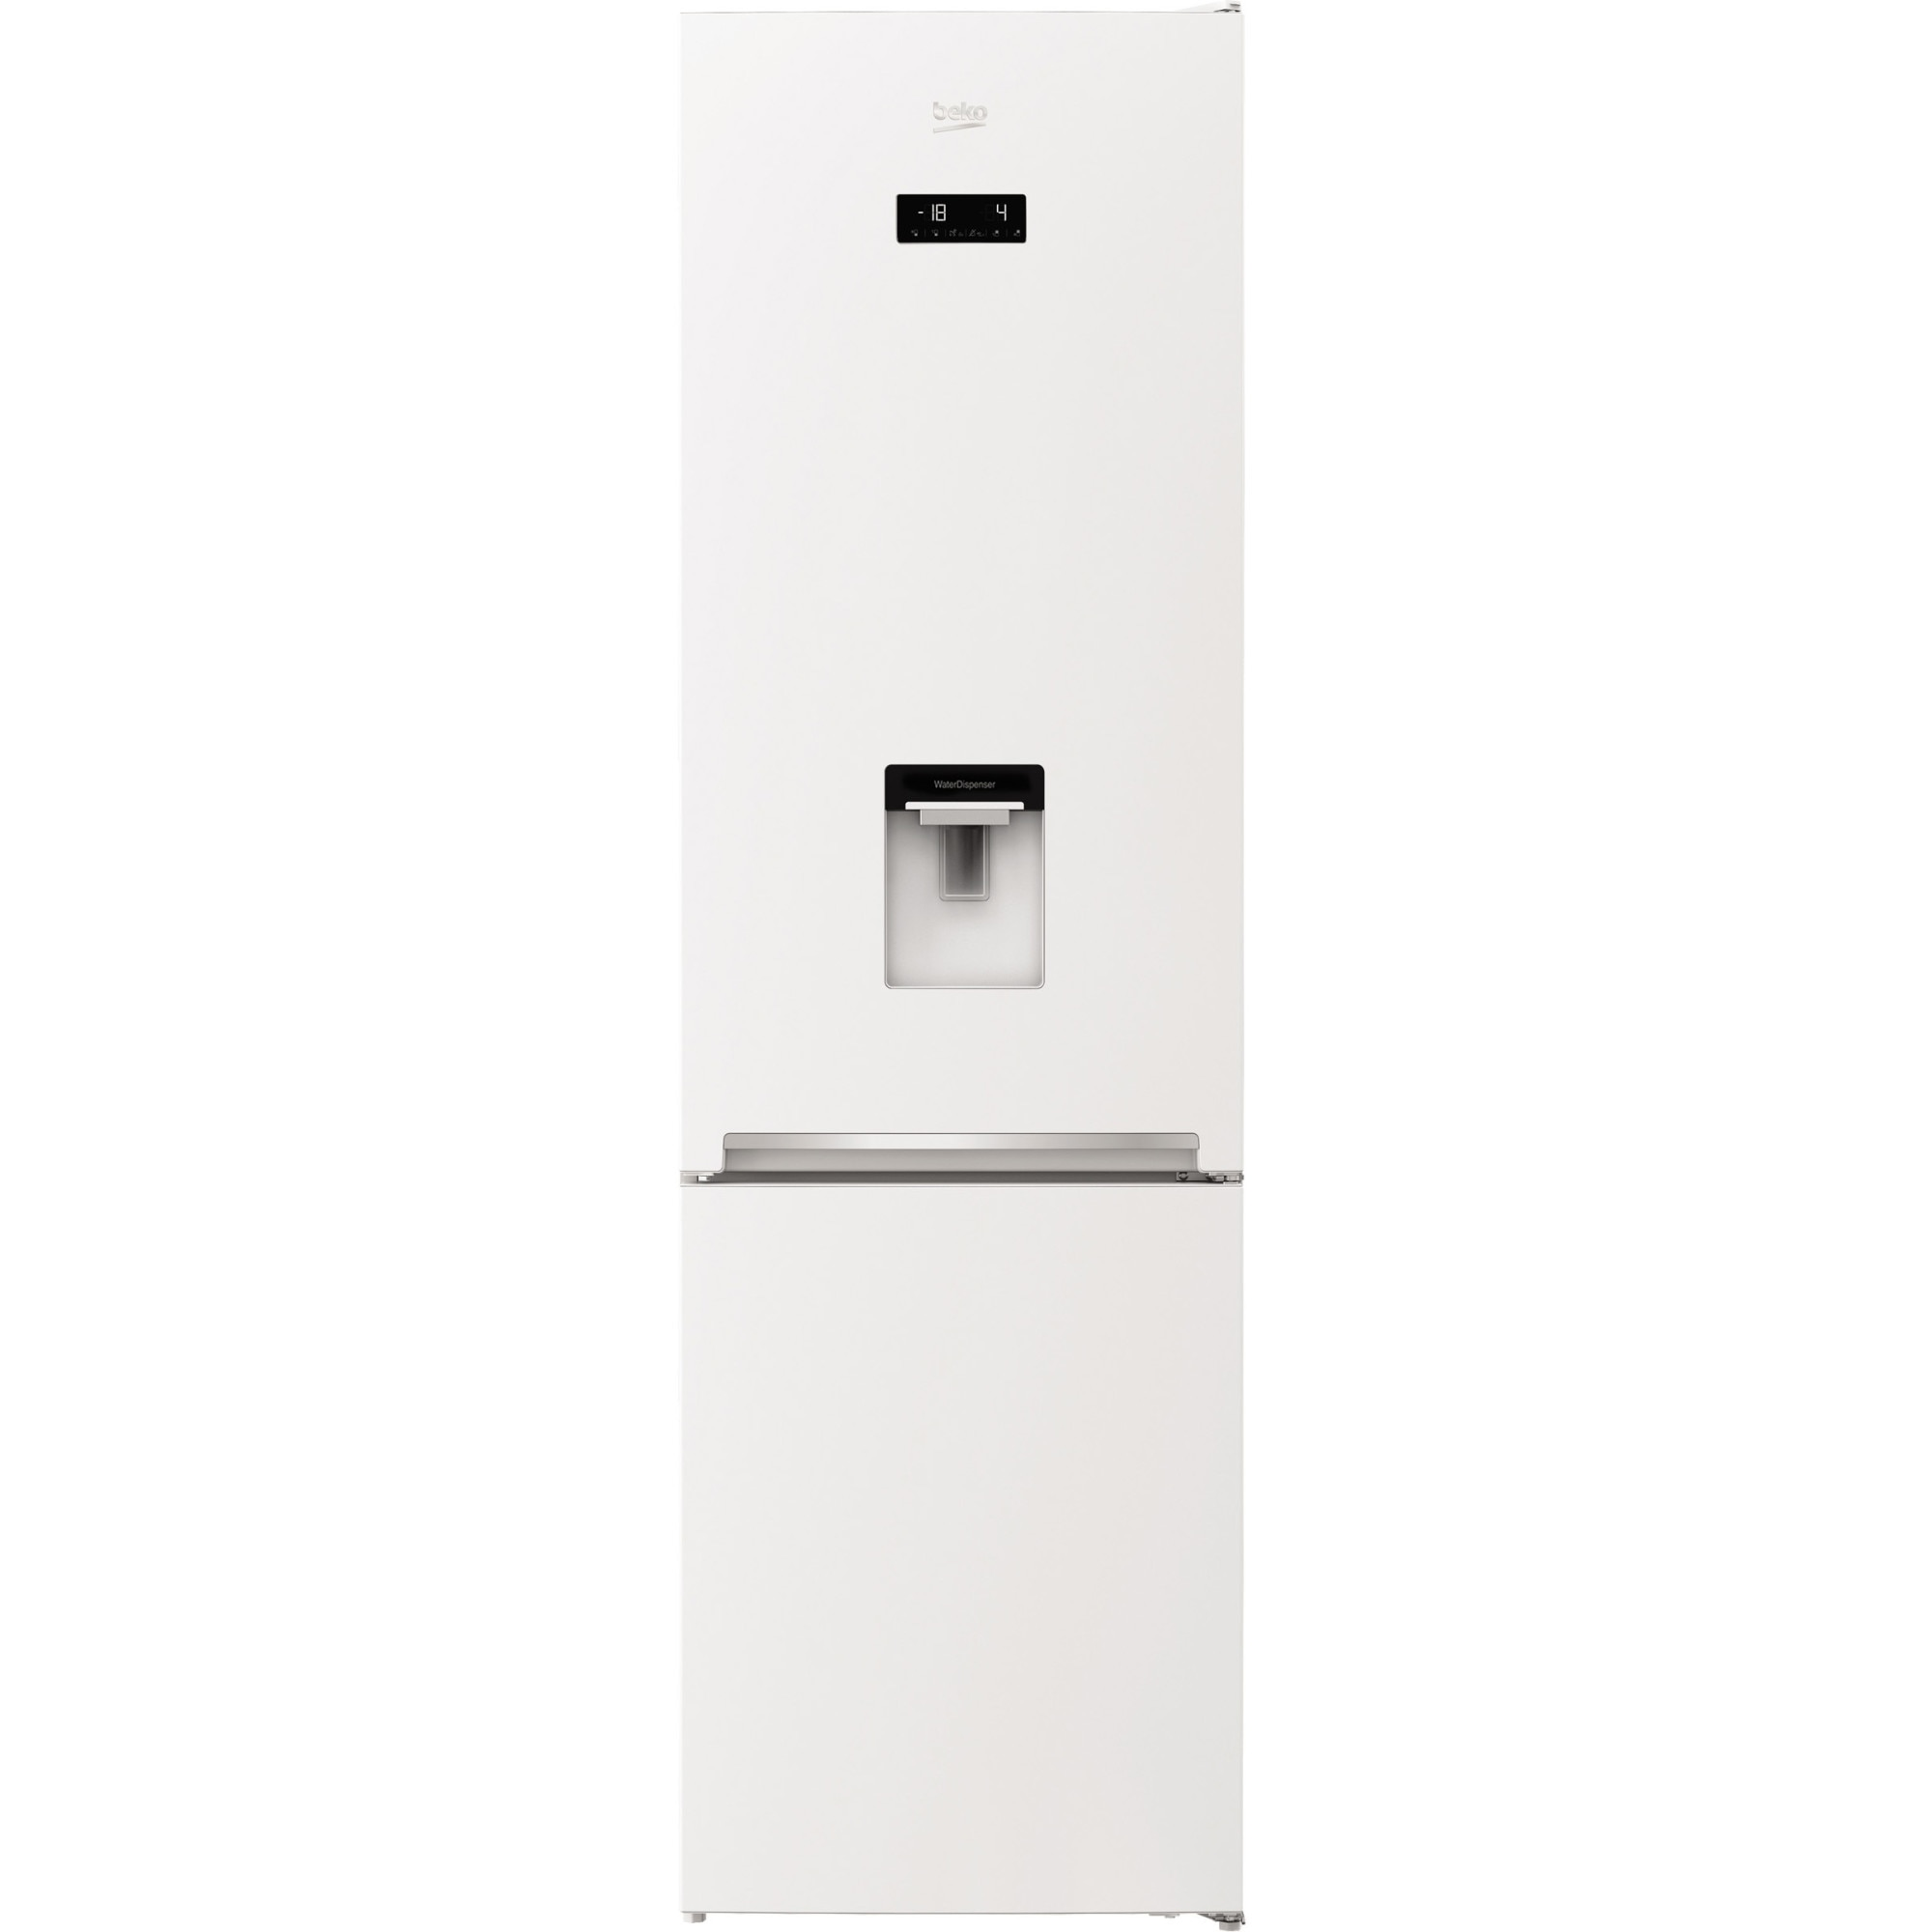 Fotografie Combina frigorifica Beko RCNA406E40DZWN, 362 l, NeoFrost Dual Cooling, Display touch control, Raft sticle, Clasa A++, H 203 cm, Alb